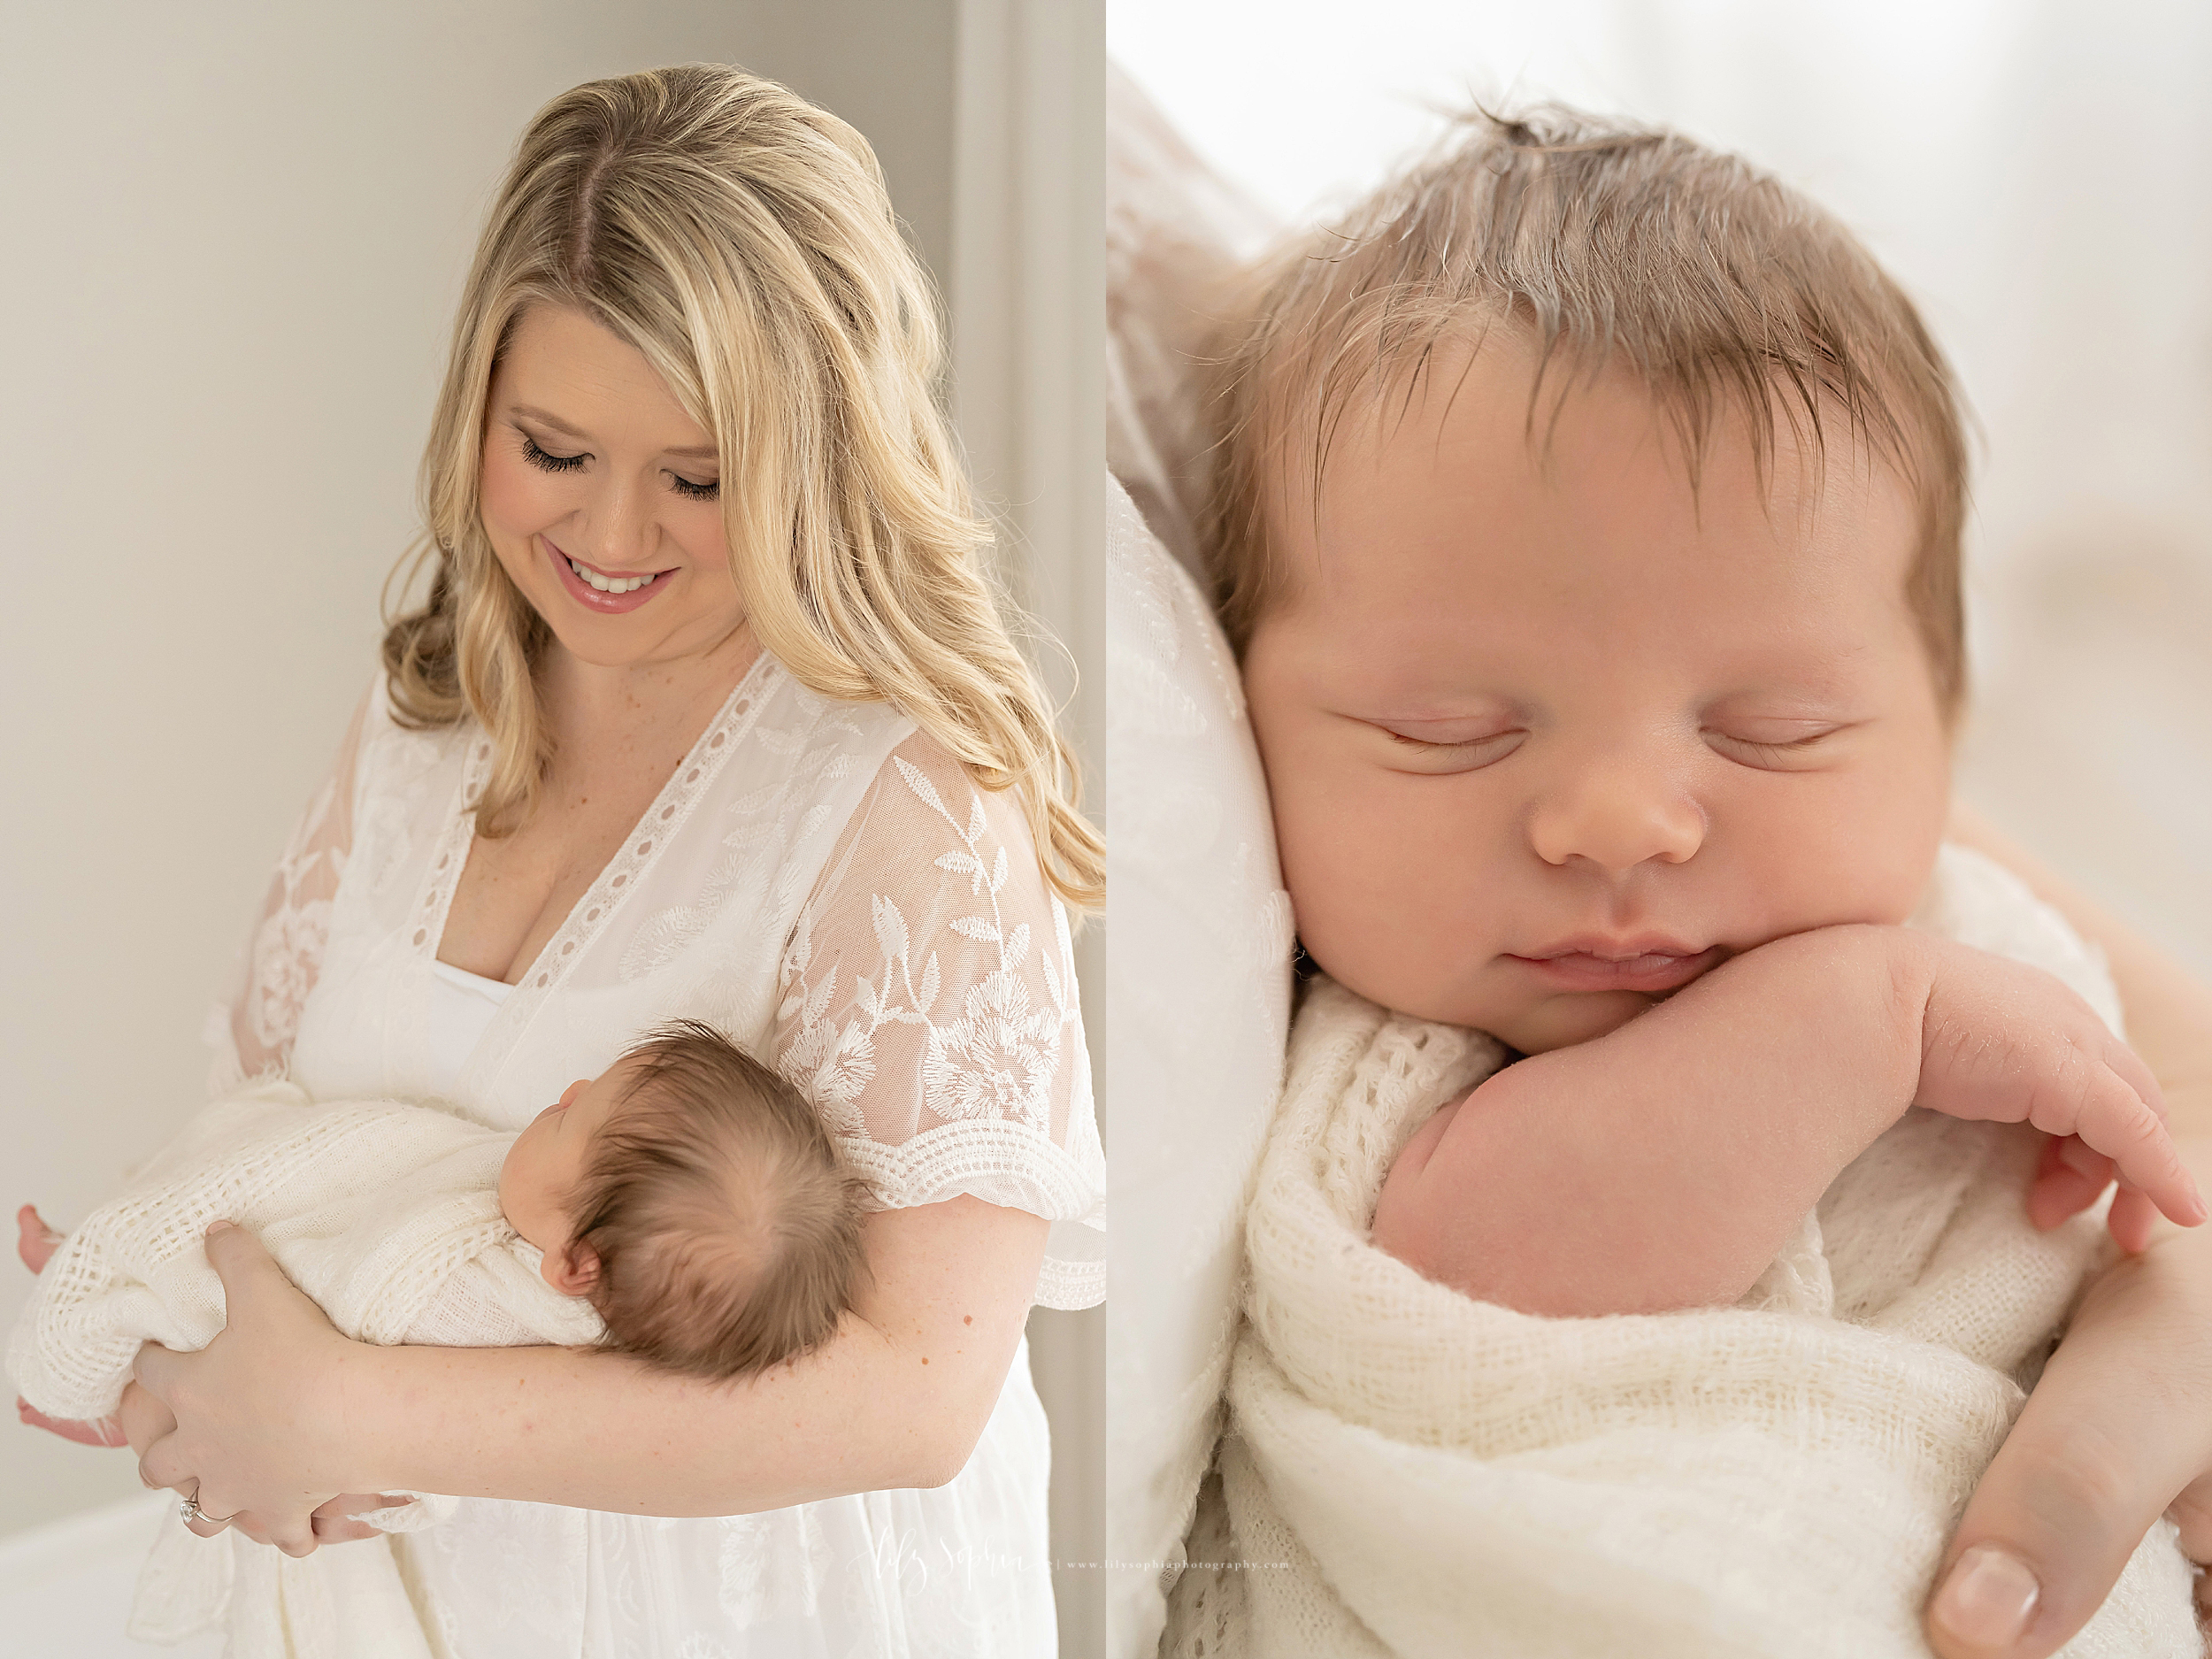 atlanta-midtown-brookhaven-ashford-dunwoody-virginia-highlands-roswell-decatur-lily-sophia-photography-newborn-baby-boy-big-brother-family-studio-session_0620.jpg